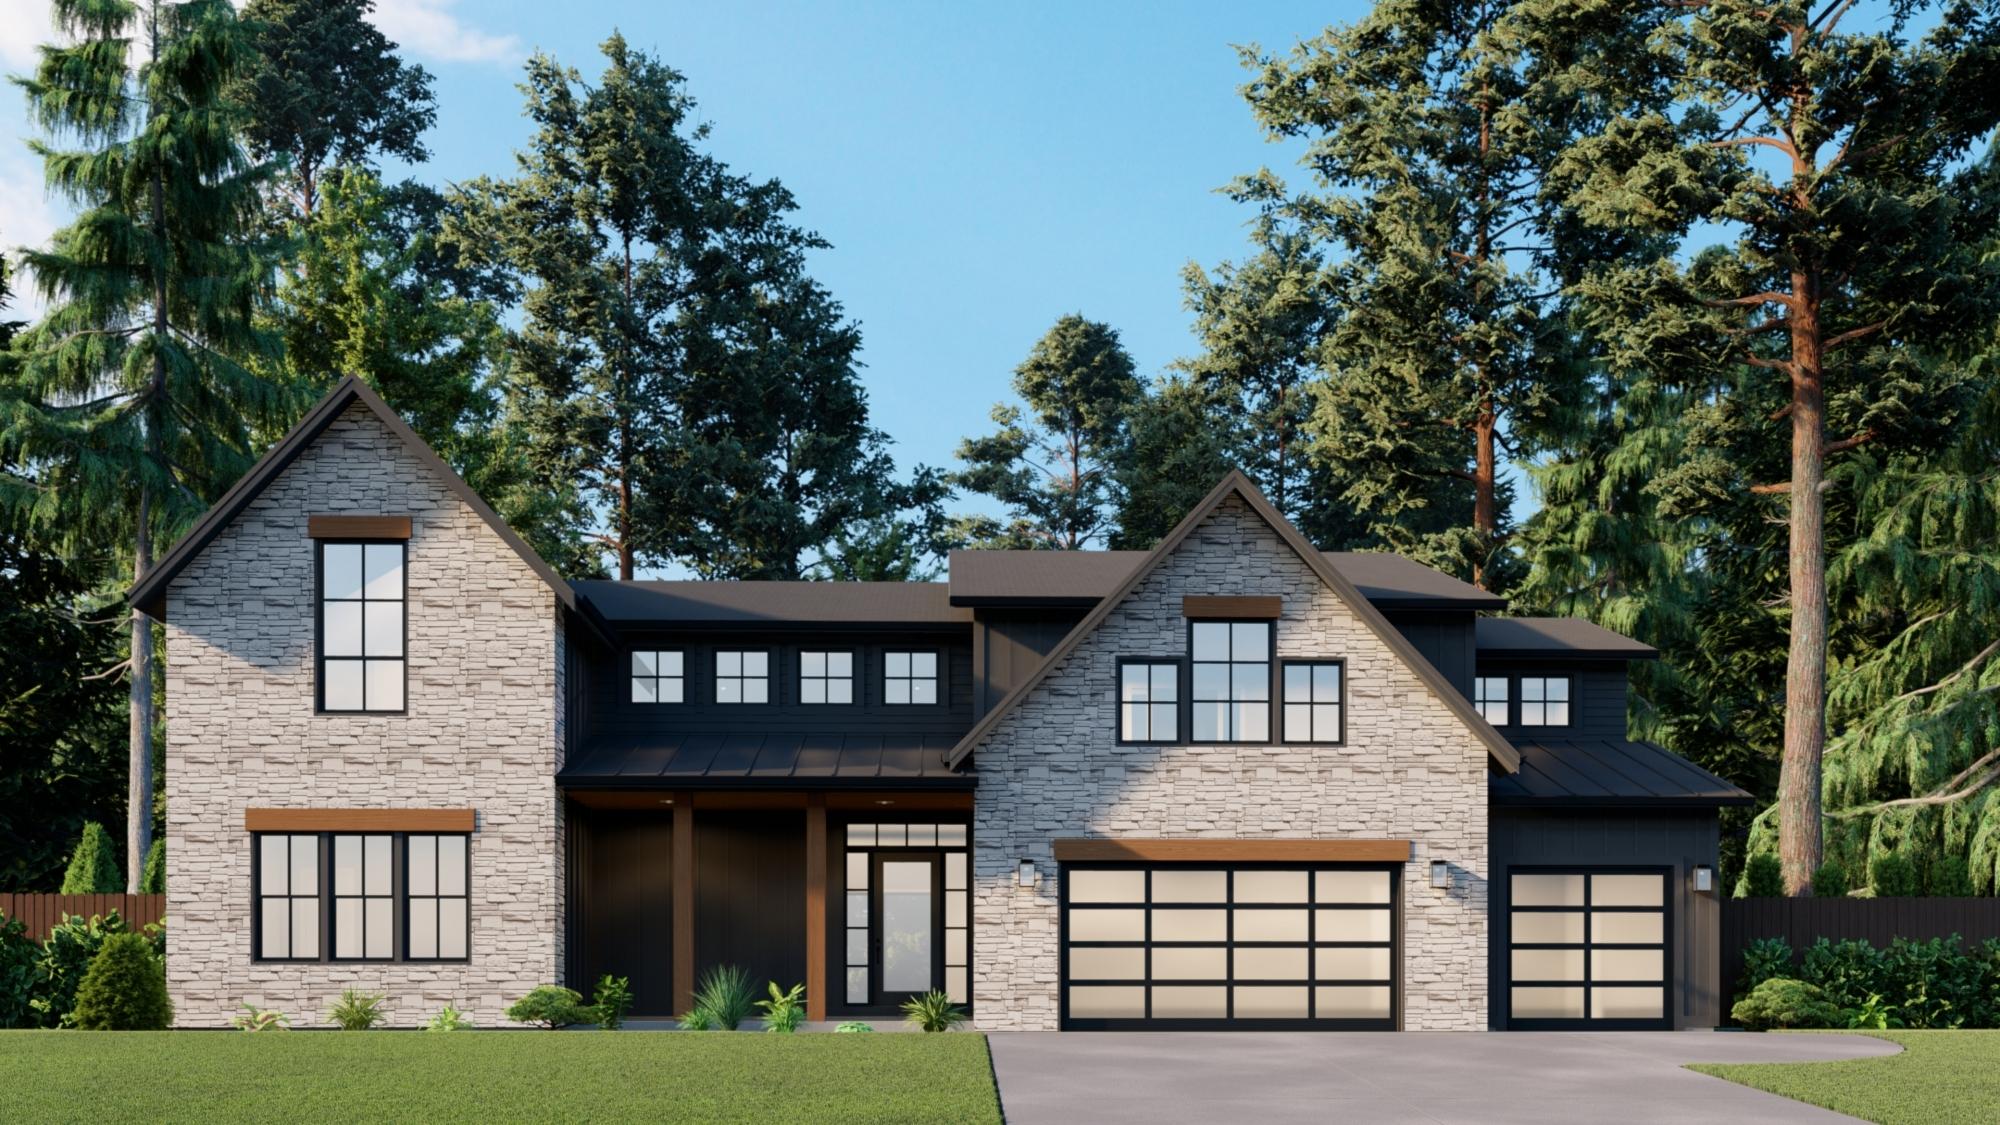 259 Pine Valley Road | Renaissance Homes